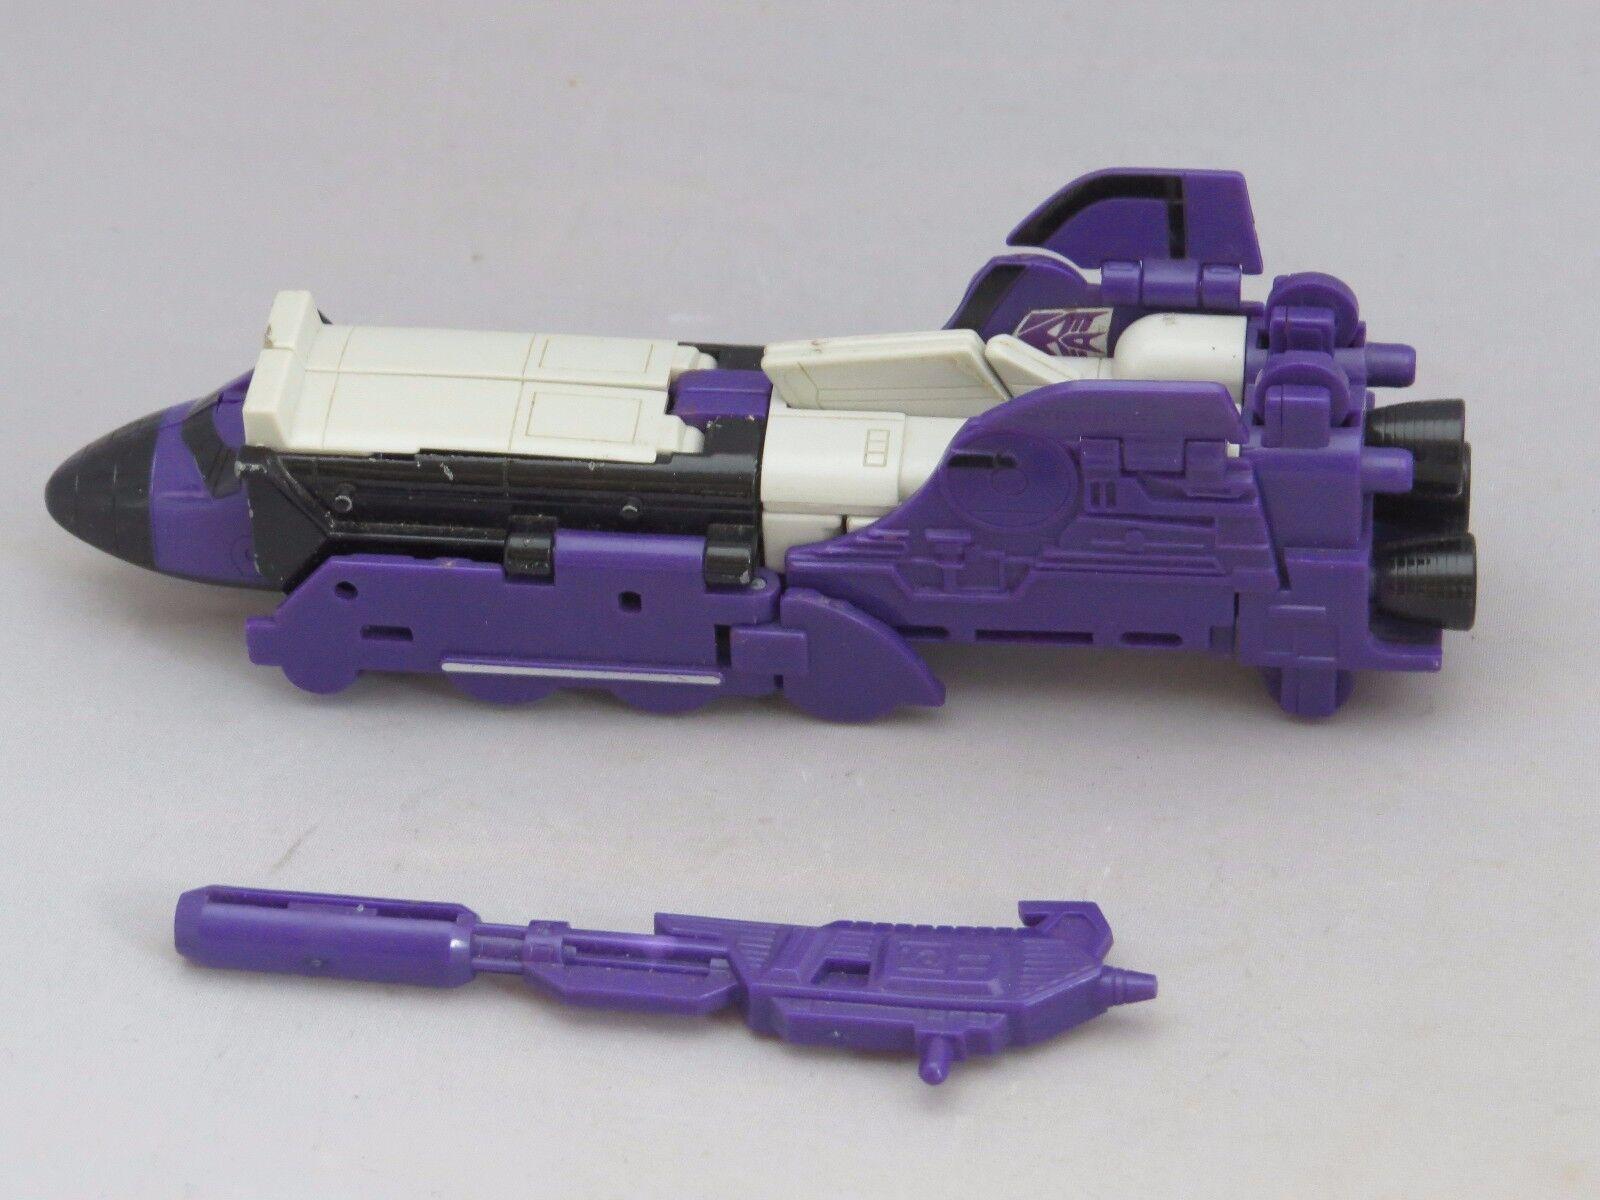 Astredrain Complete 1985 G1 Transformers Space Shuttle Train Figure